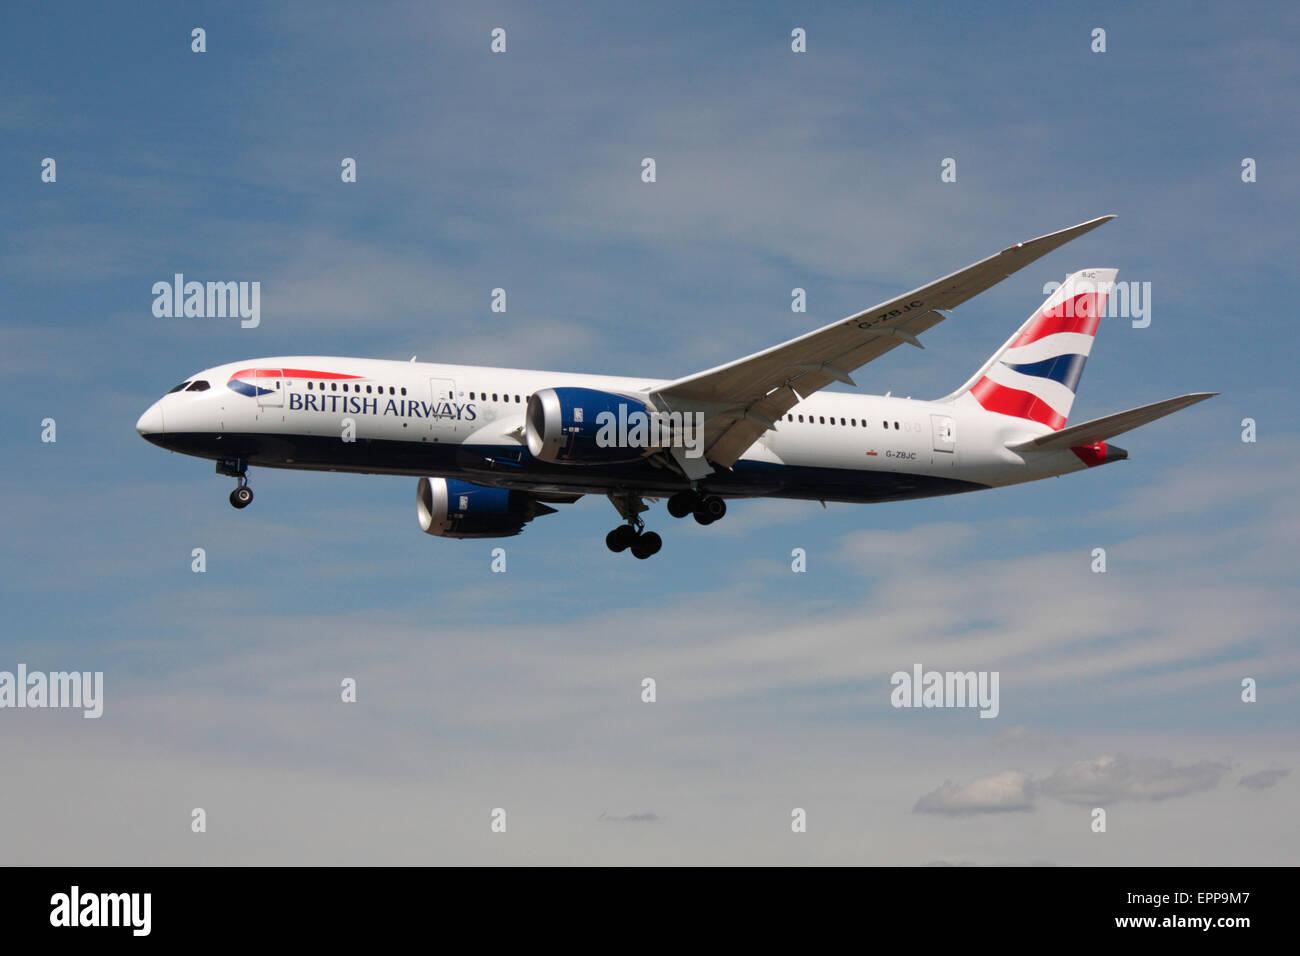 British Airways Boeing 787-8 Dreamliner long haul passenger jet plane on approach. Modern civil aviation. - Stock Image